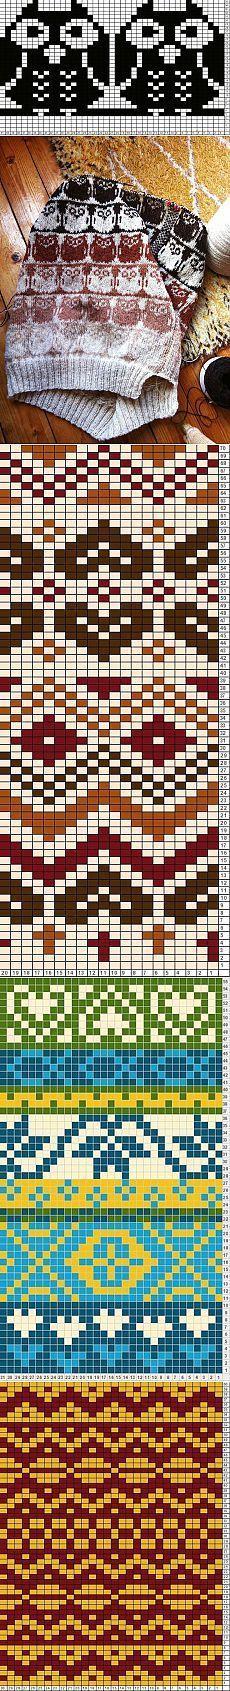 current Images knitting charts owl Style жаккард Most current Images knitting charts owl Style жаккард ВЯЗАНИЕ ДЛЯ СУМАСШЕДШИХ / Снимка 67 - Burda 2018 - svetlyachoks Owl Crochet Chart pattern by Agnes Barton annadrianna — «Pattern Libra. Fair Isle Knitting Patterns, Fair Isle Pattern, Knitting Charts, Loom Knitting, Knitting Stitches, Knitting Designs, Knitting Projects, Hand Knitting, Knitting Ideas